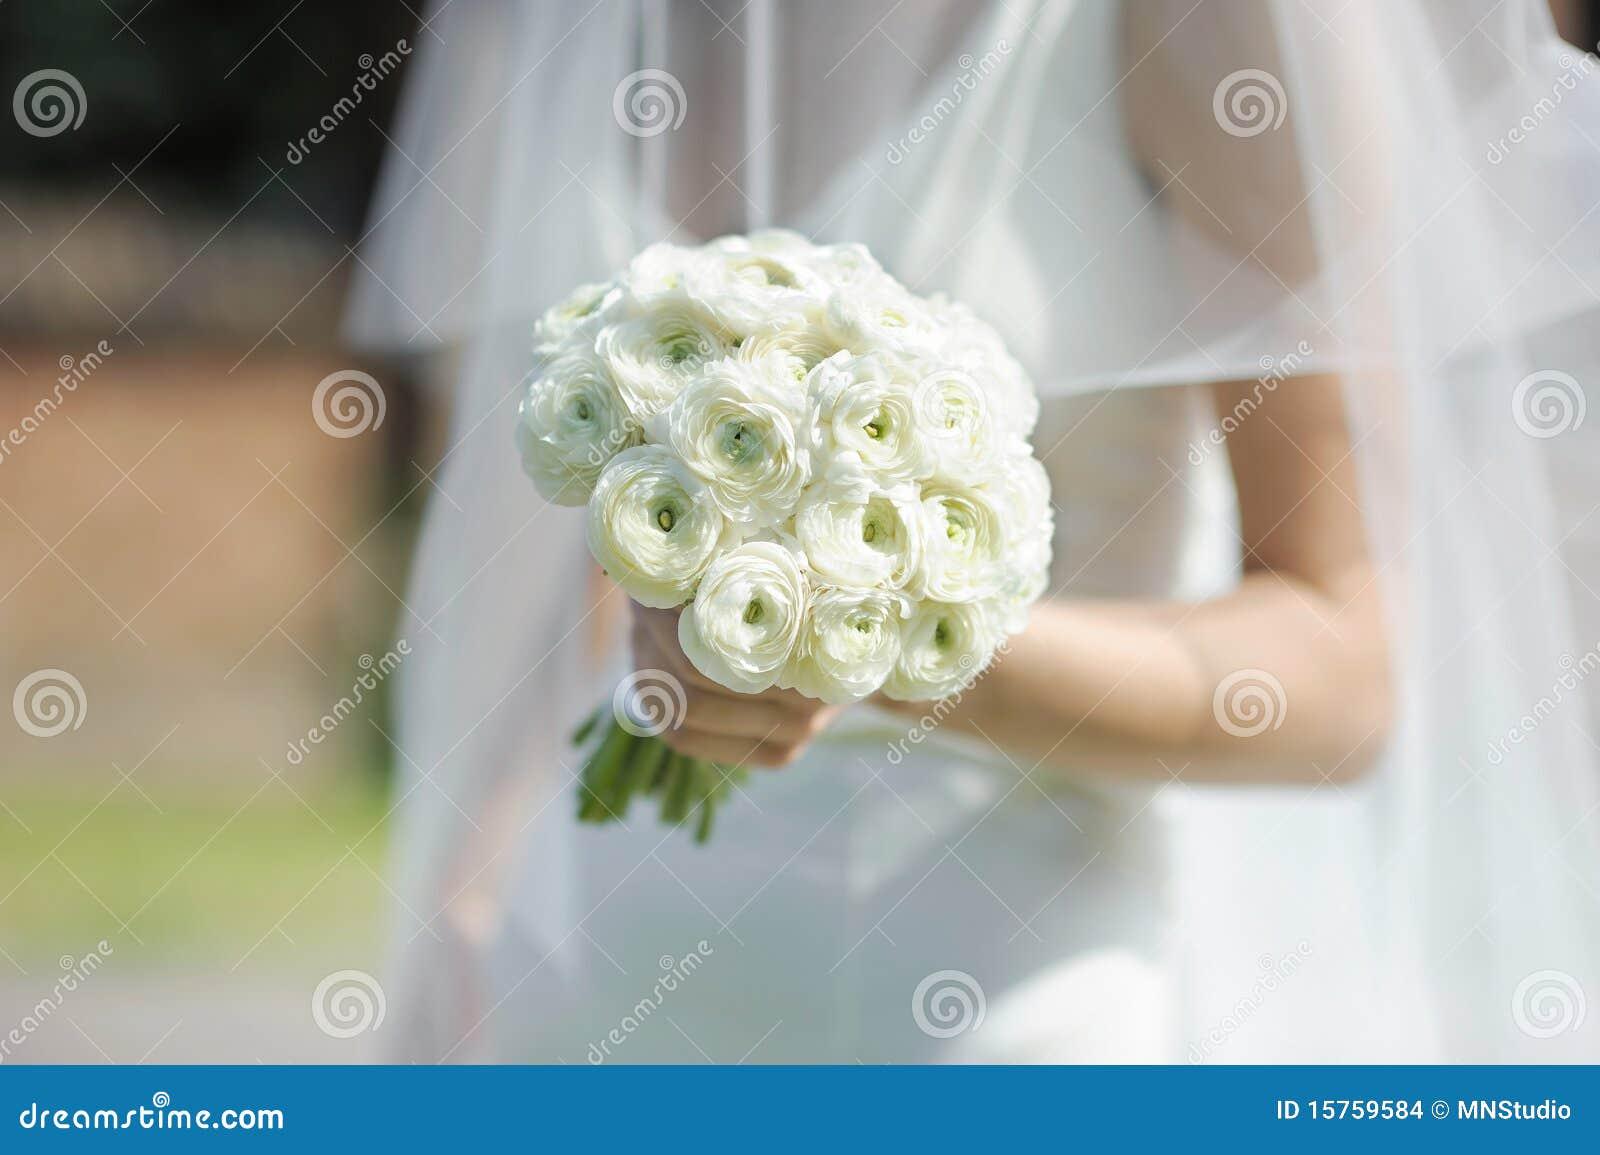 Bride holding white wedding flowers bouquet stock photo image of bride holding white wedding flowers bouquet izmirmasajfo